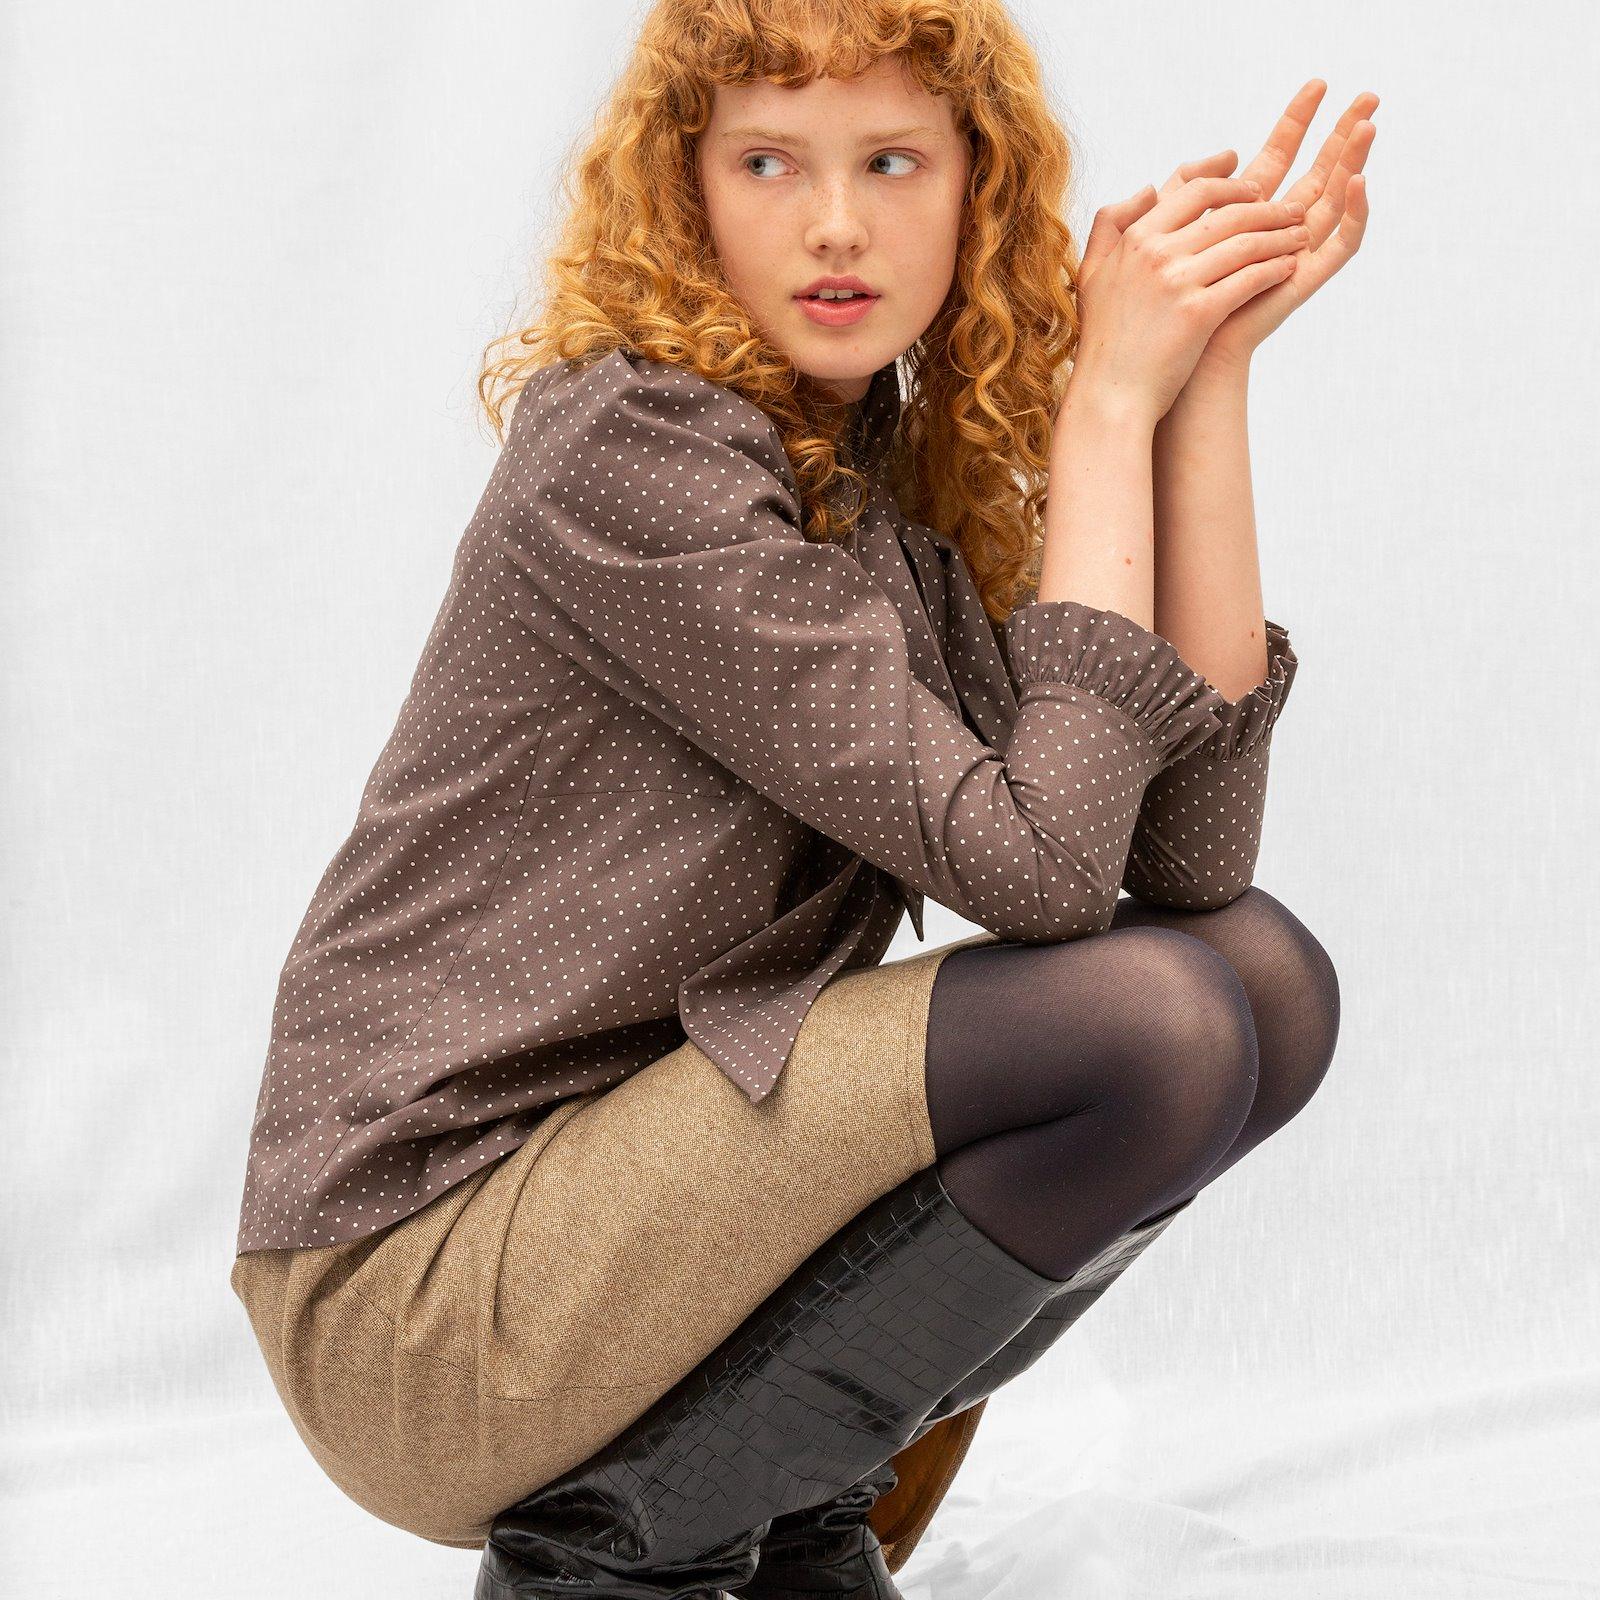 Skirt with A-shape, 44/16 p22075_852396_p21038_300227__sskit